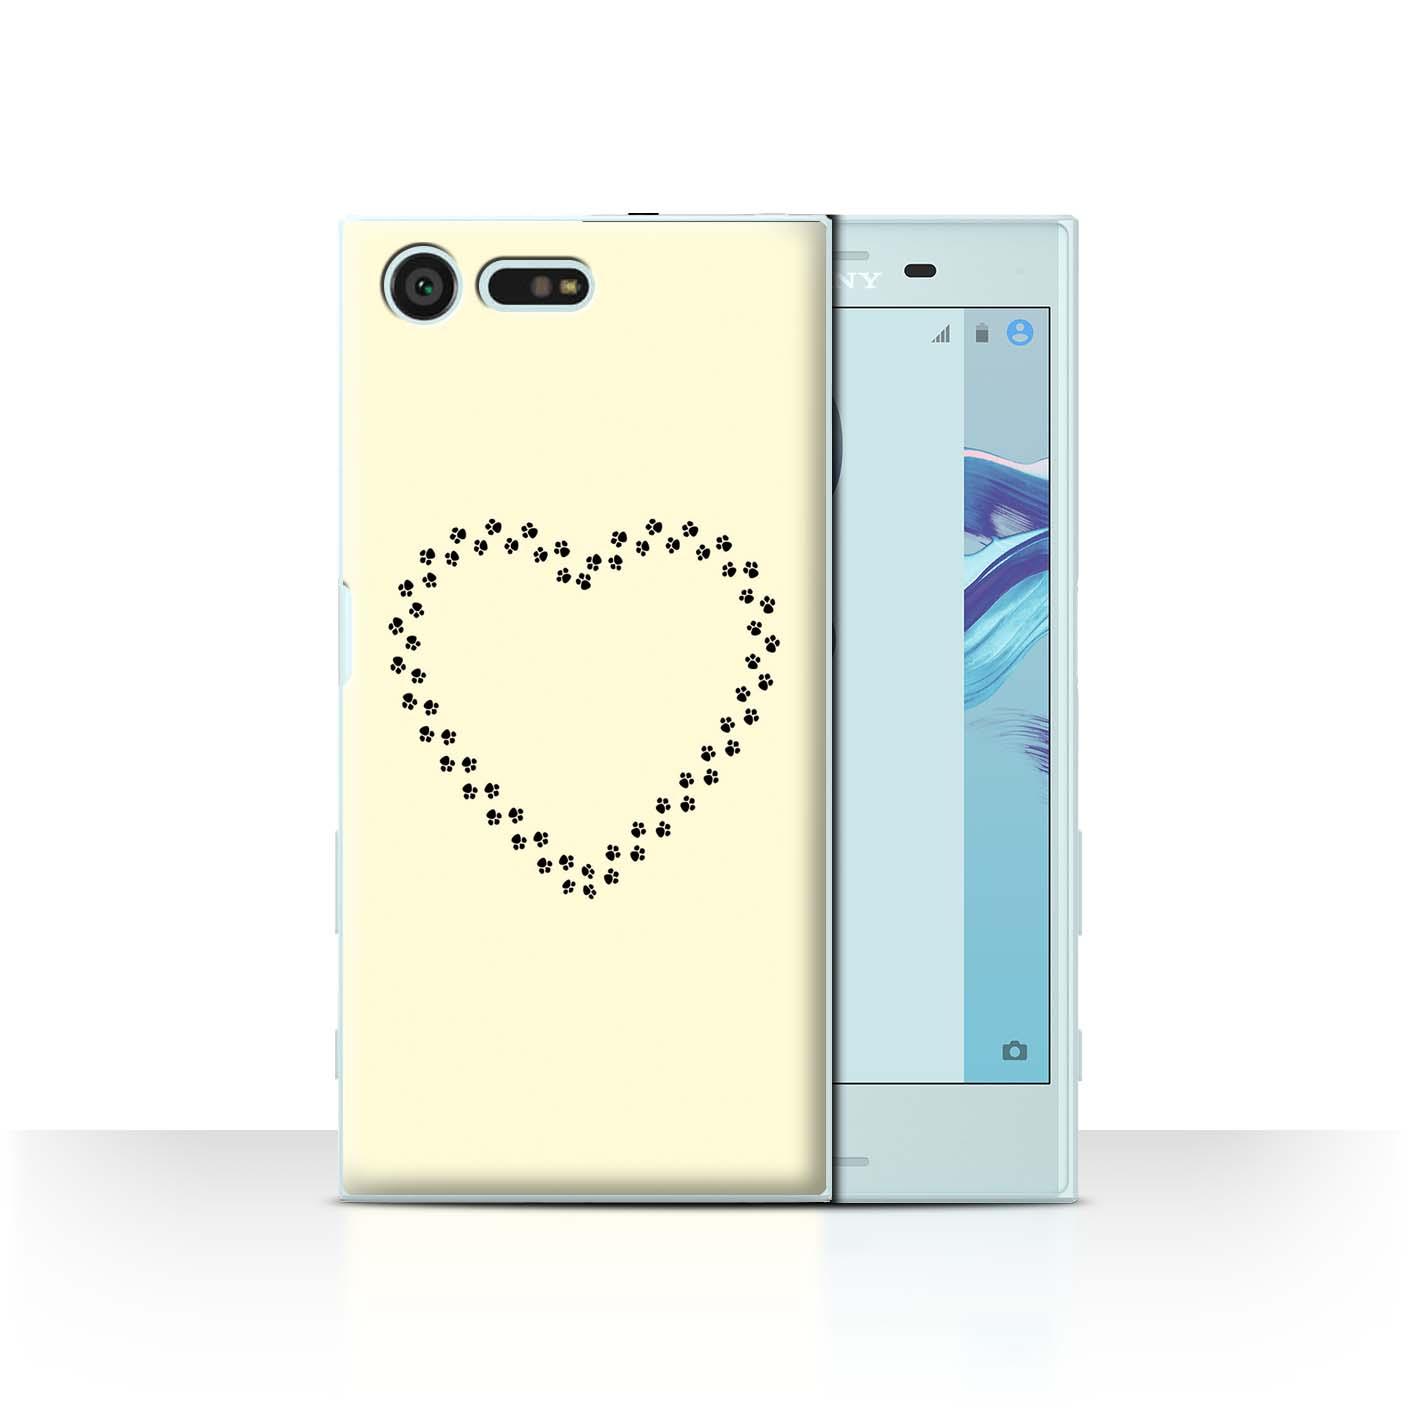 STUFF4-Back-Case-Cover-Skin-for-Sony-Xperia-X-Compact-Cute-Cartoon-Cat